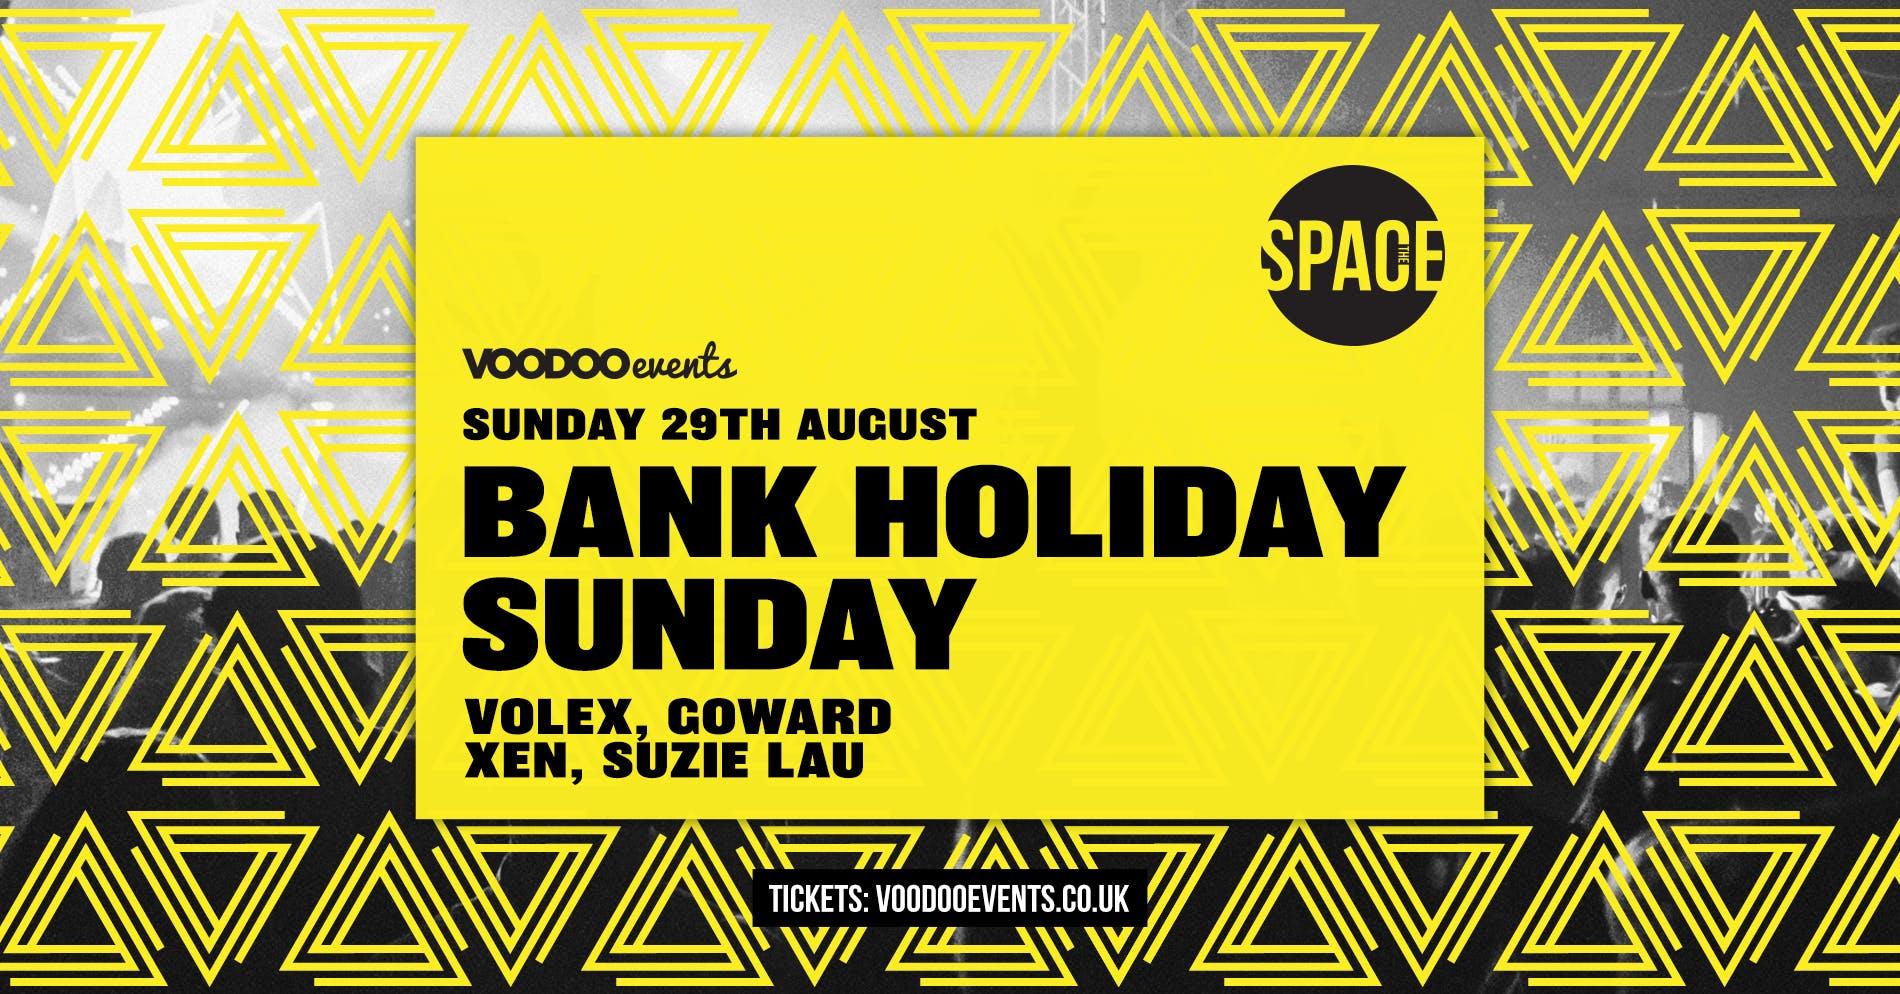 SPACE – Bank Holiday Sunday